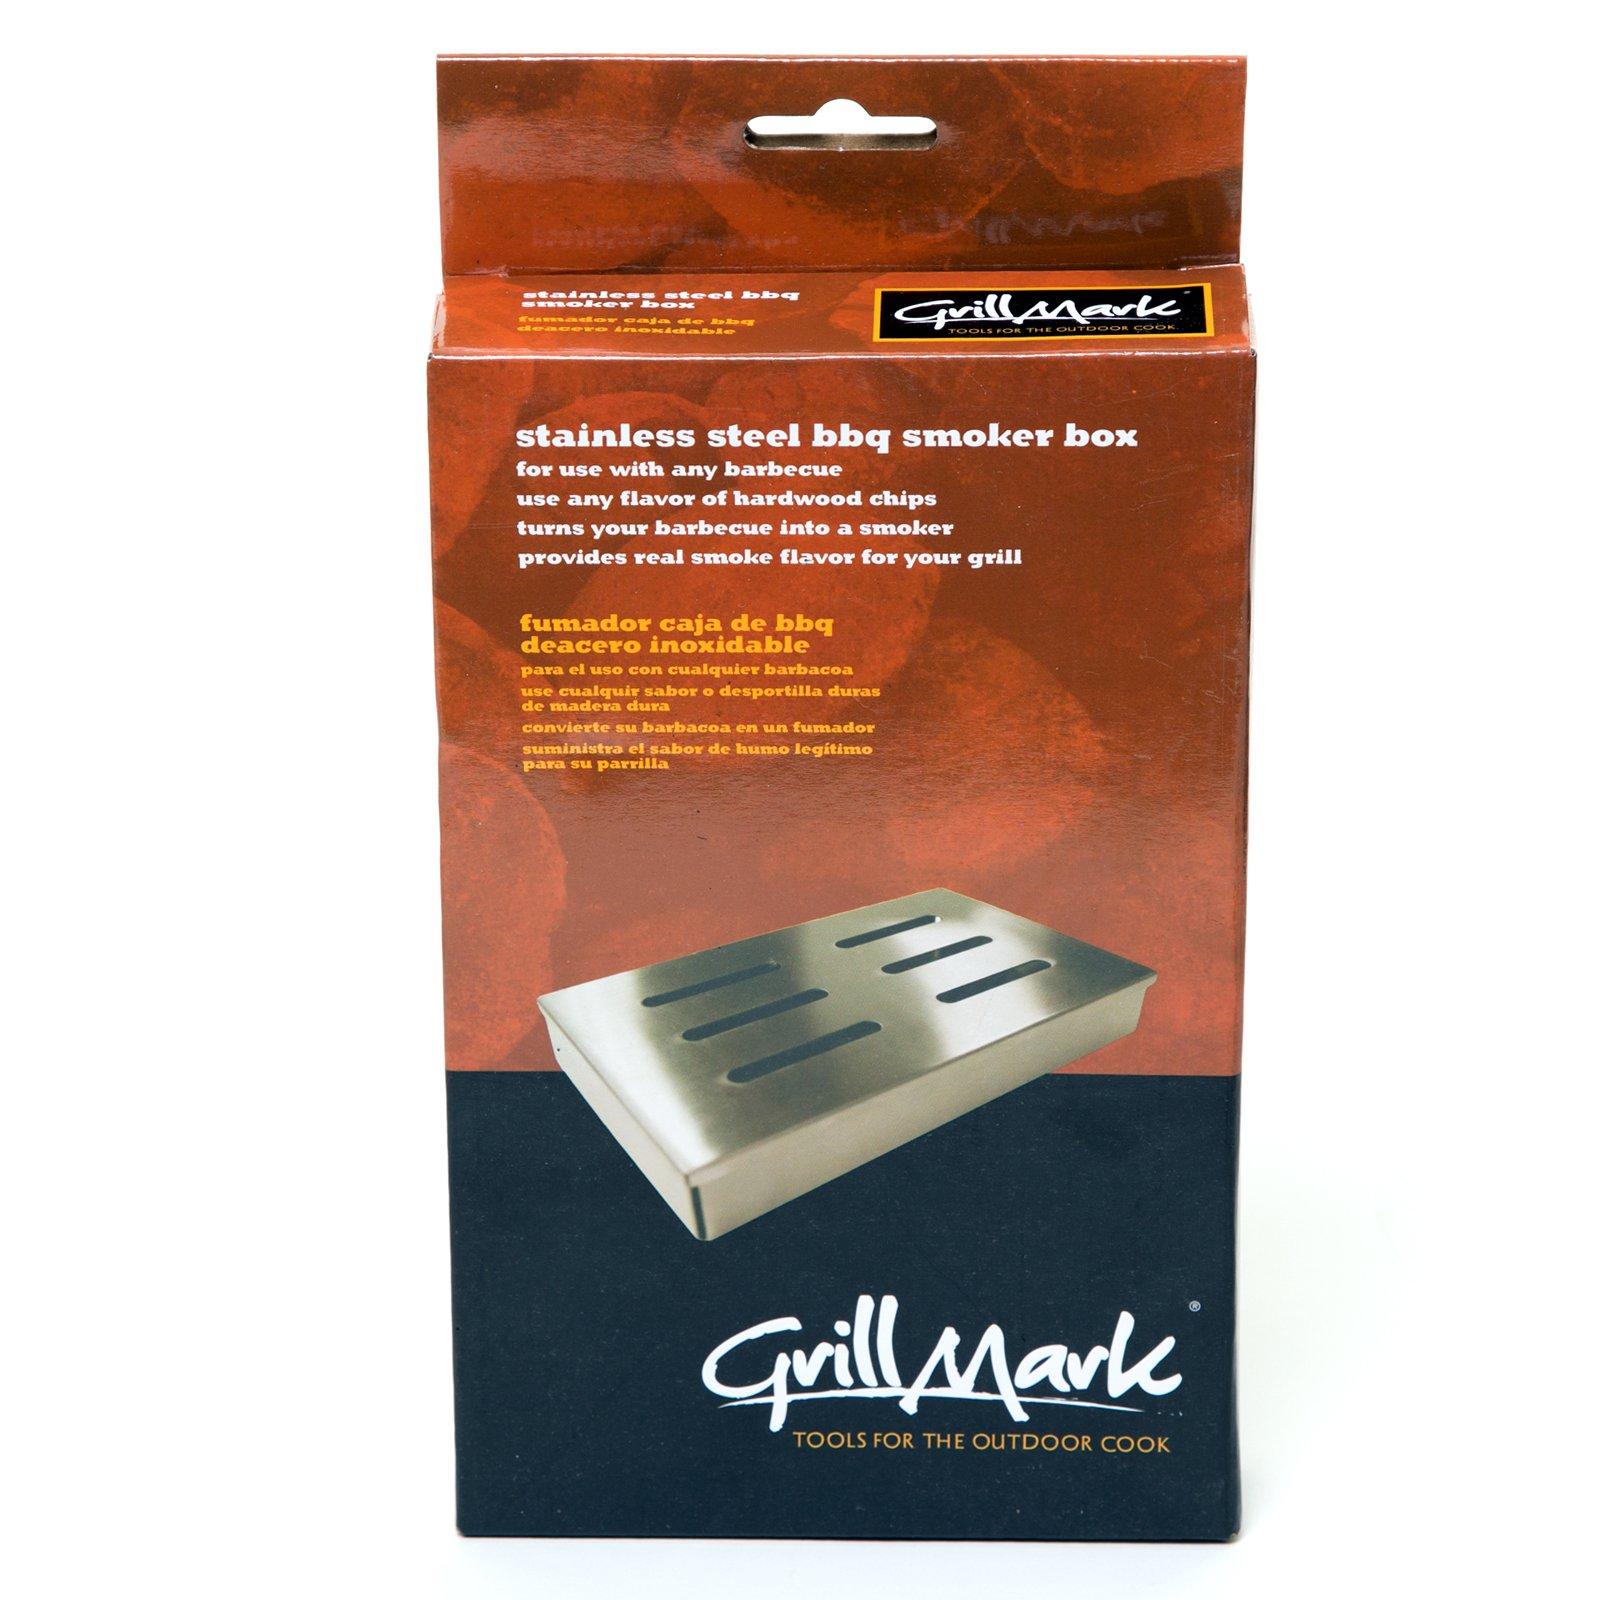 Grillmark Bbq Smoker Box 8'' X 5'' X 2'' Stainless Steel